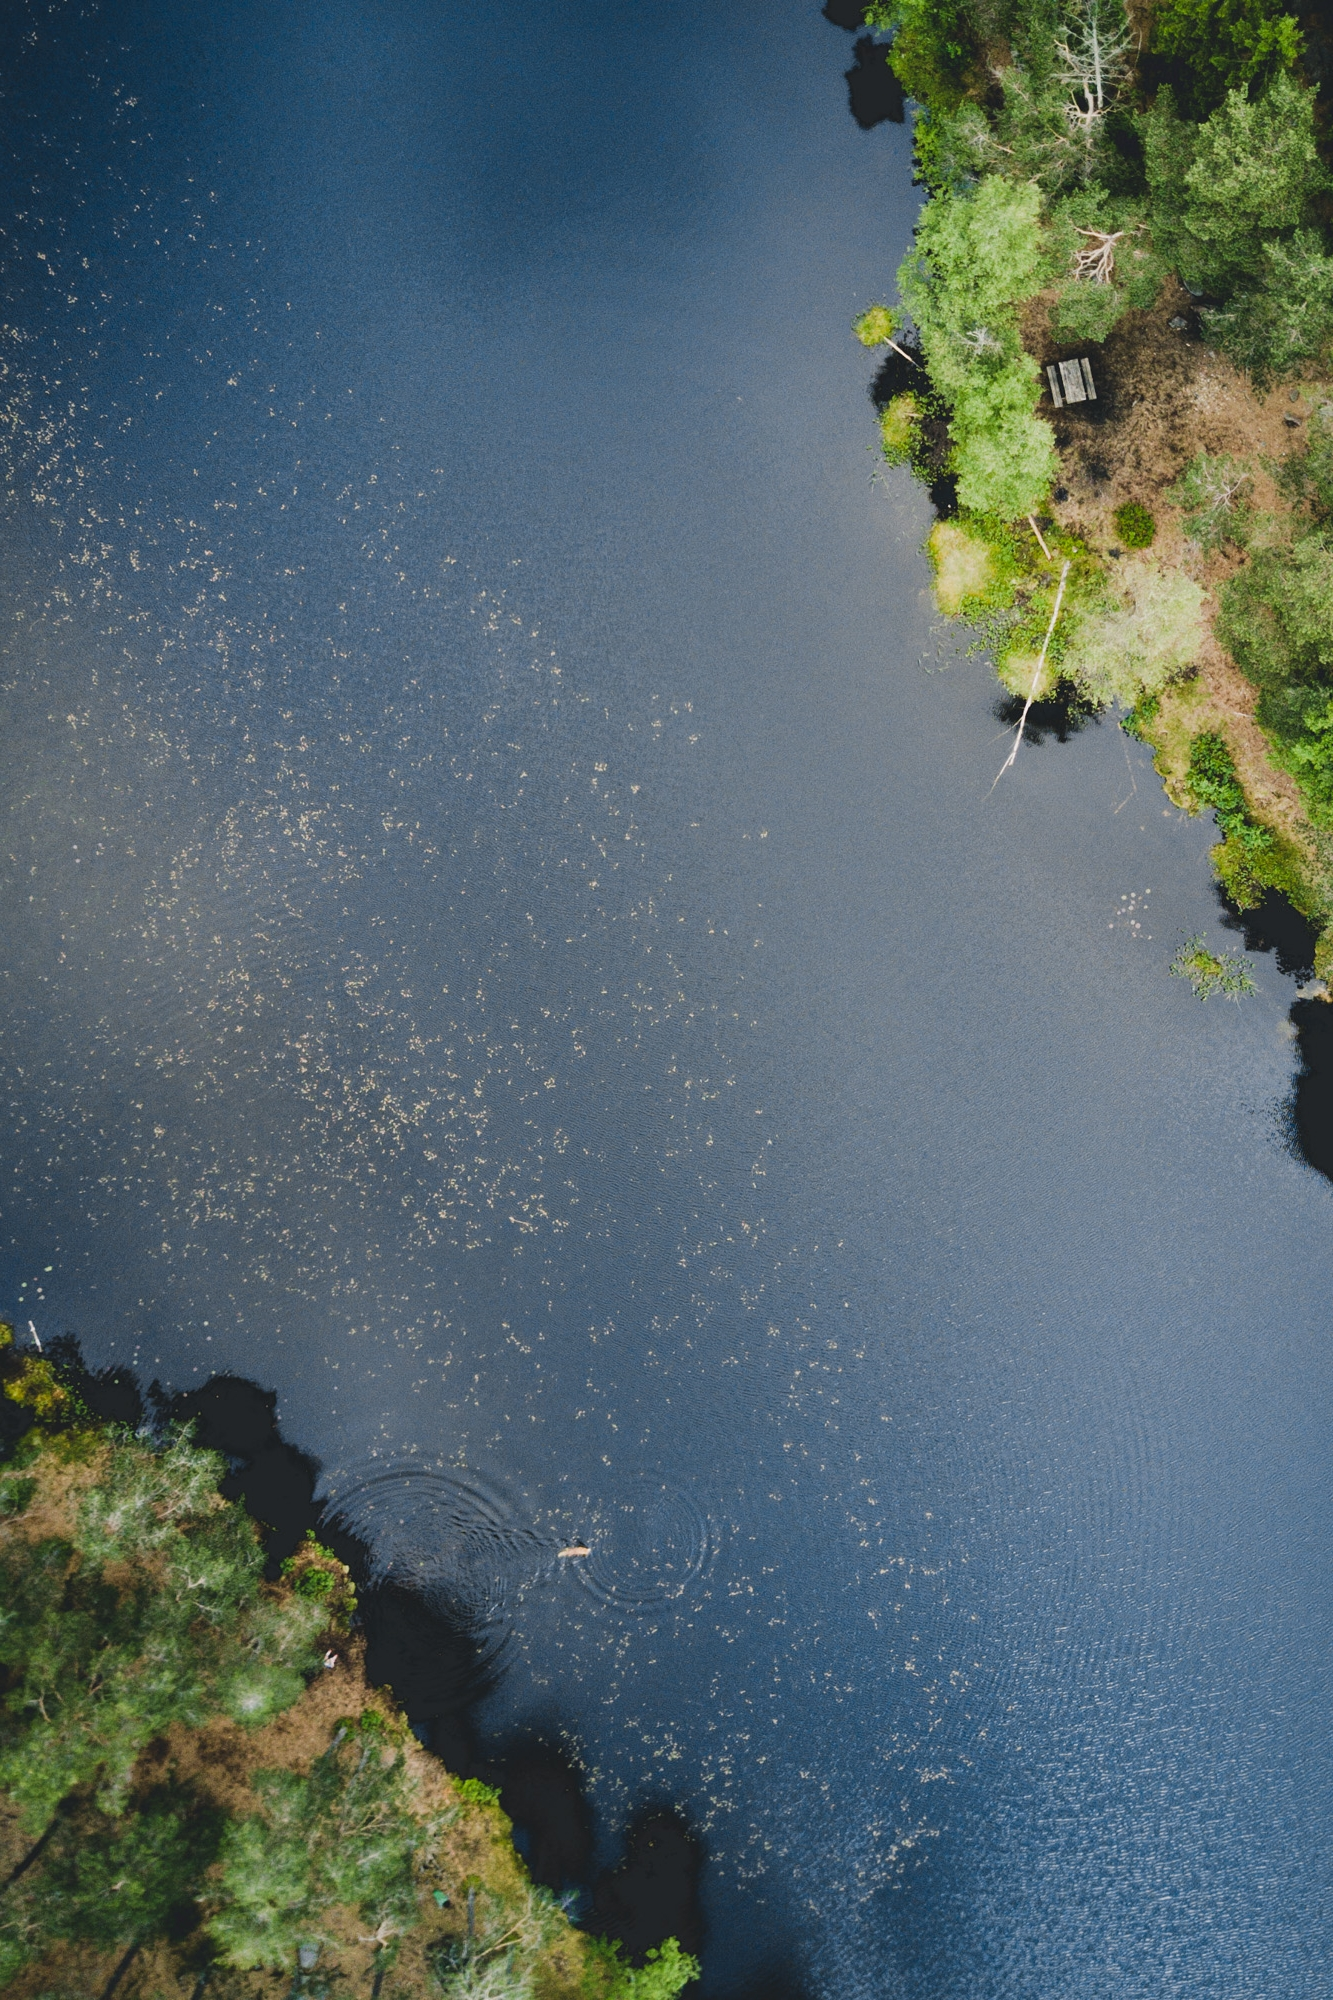 drone 26.06.17-1.jpg